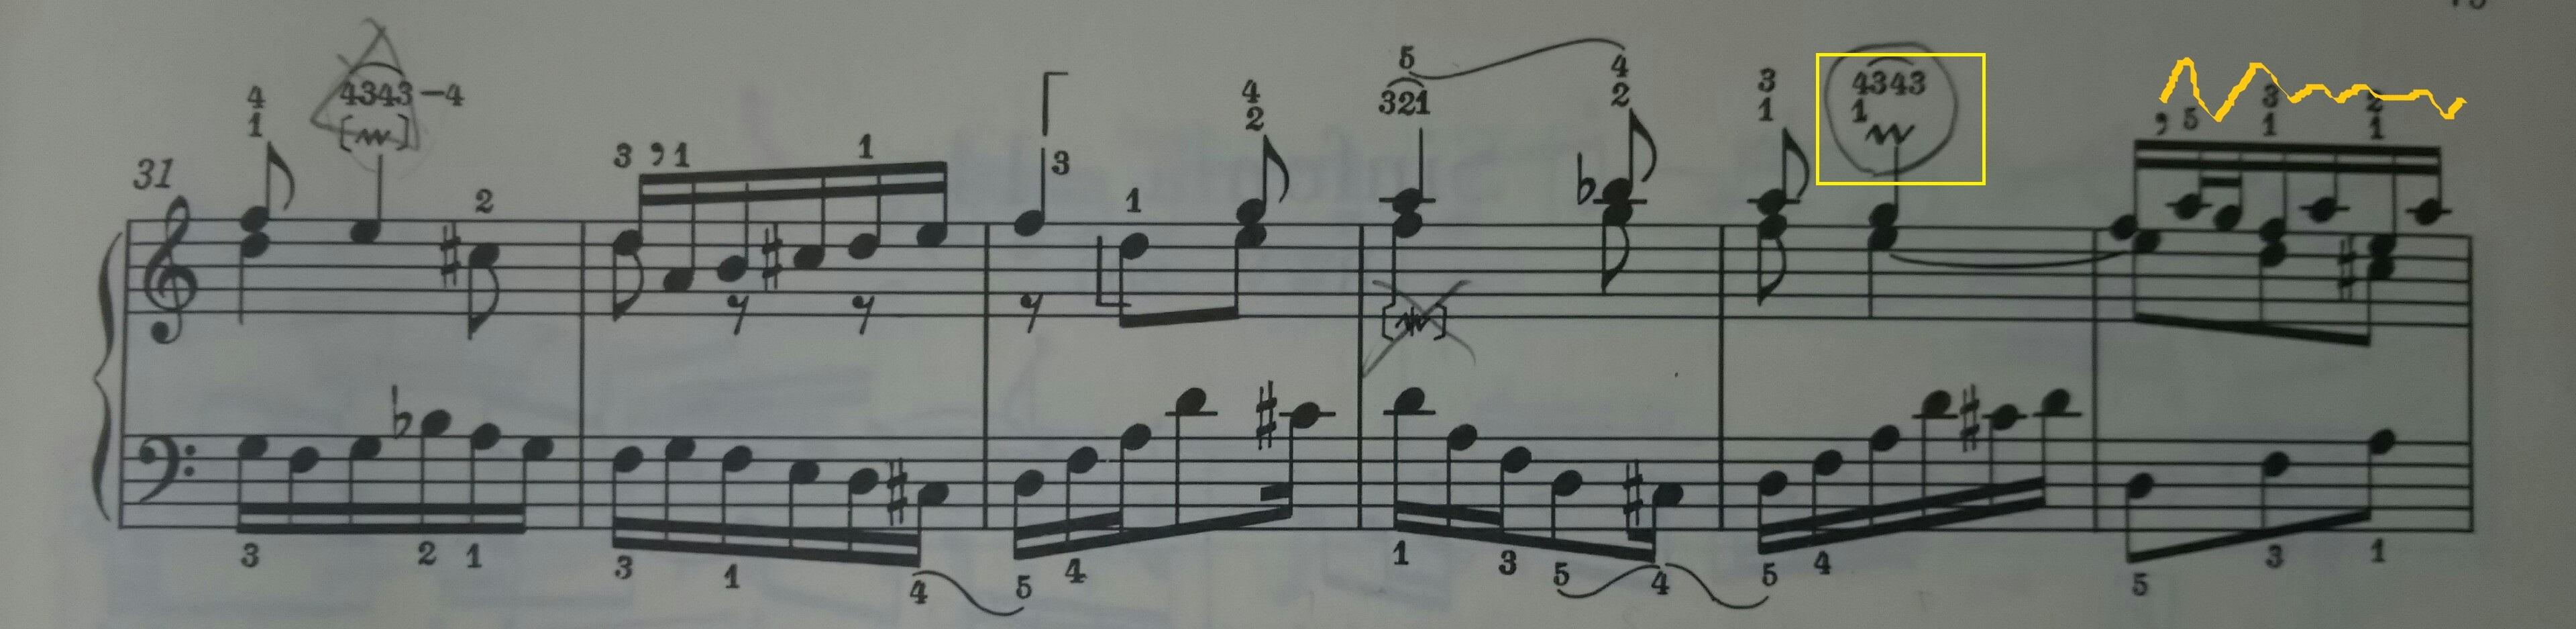 IMG_20180629_133321_BWV799_31-36.jpg